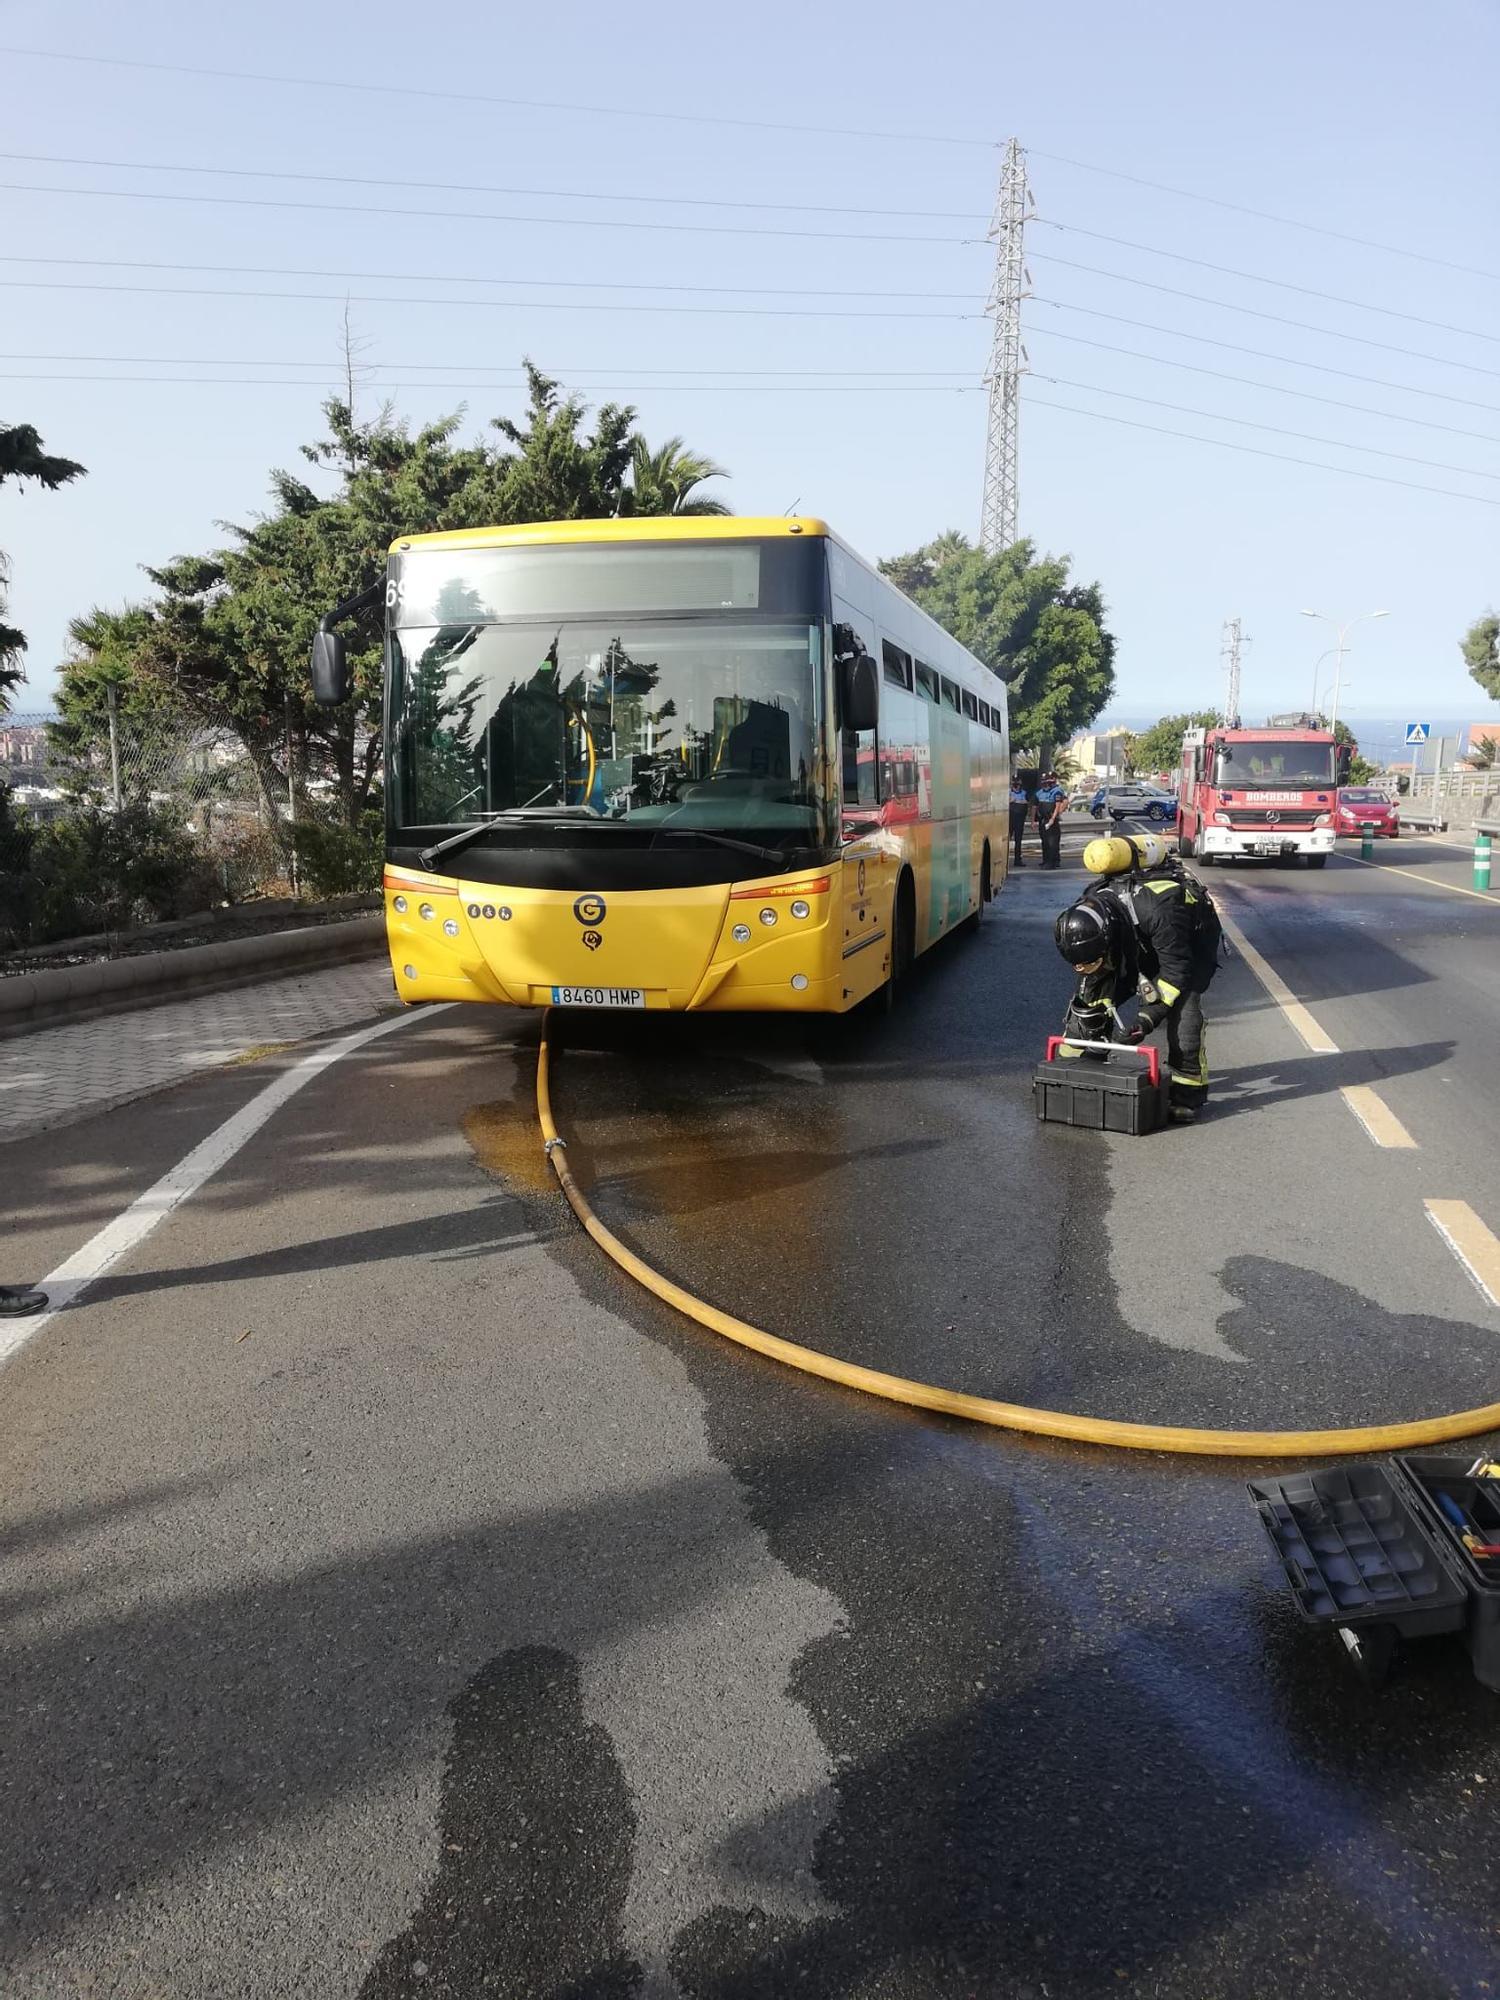 Incendio de una guagua municipal en Las Palmas de Gran Canaria